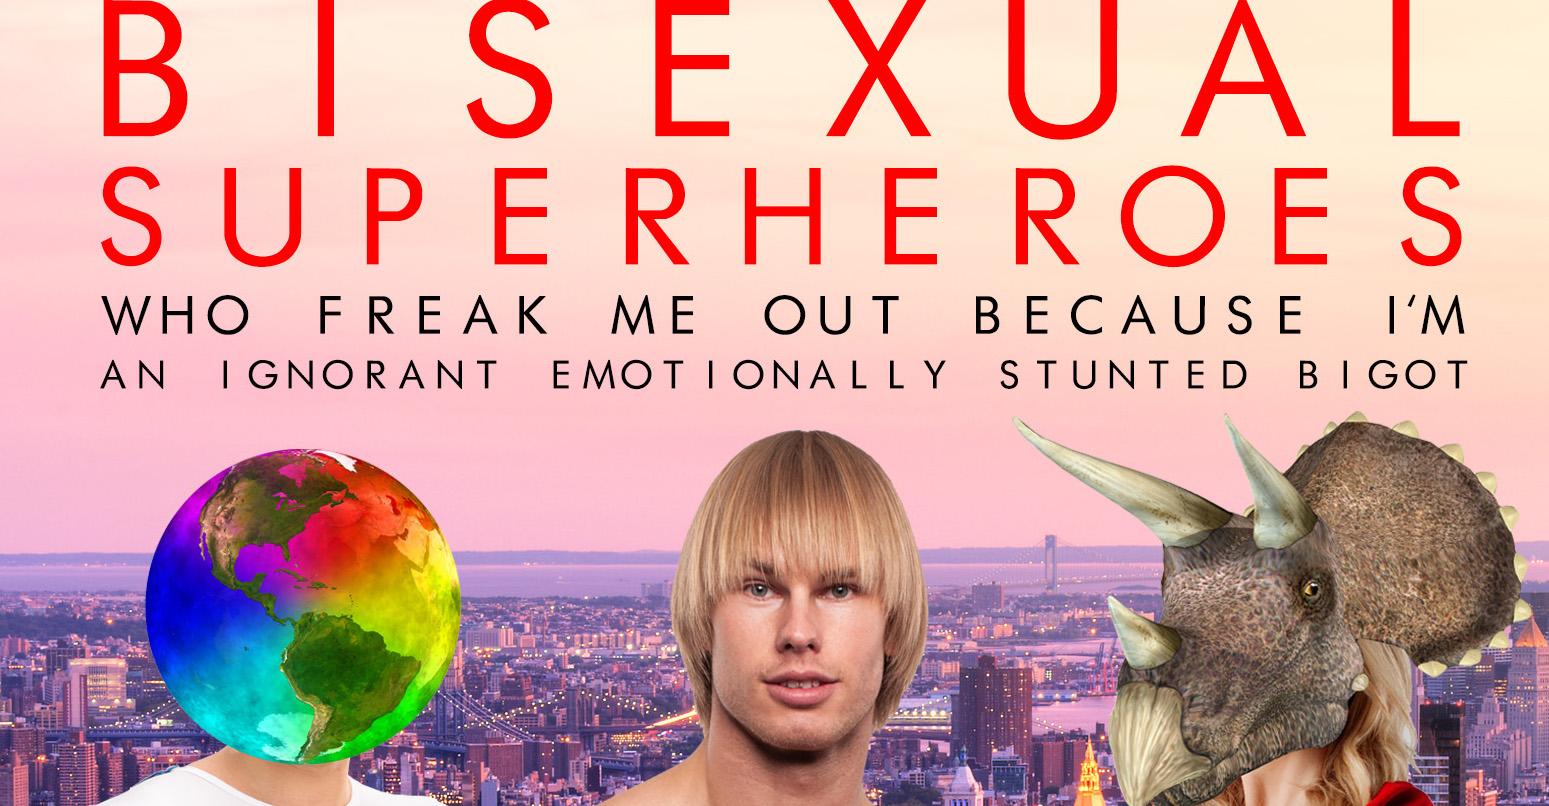 Chuck Tingle's latest mocks those angry at bisexual Superman